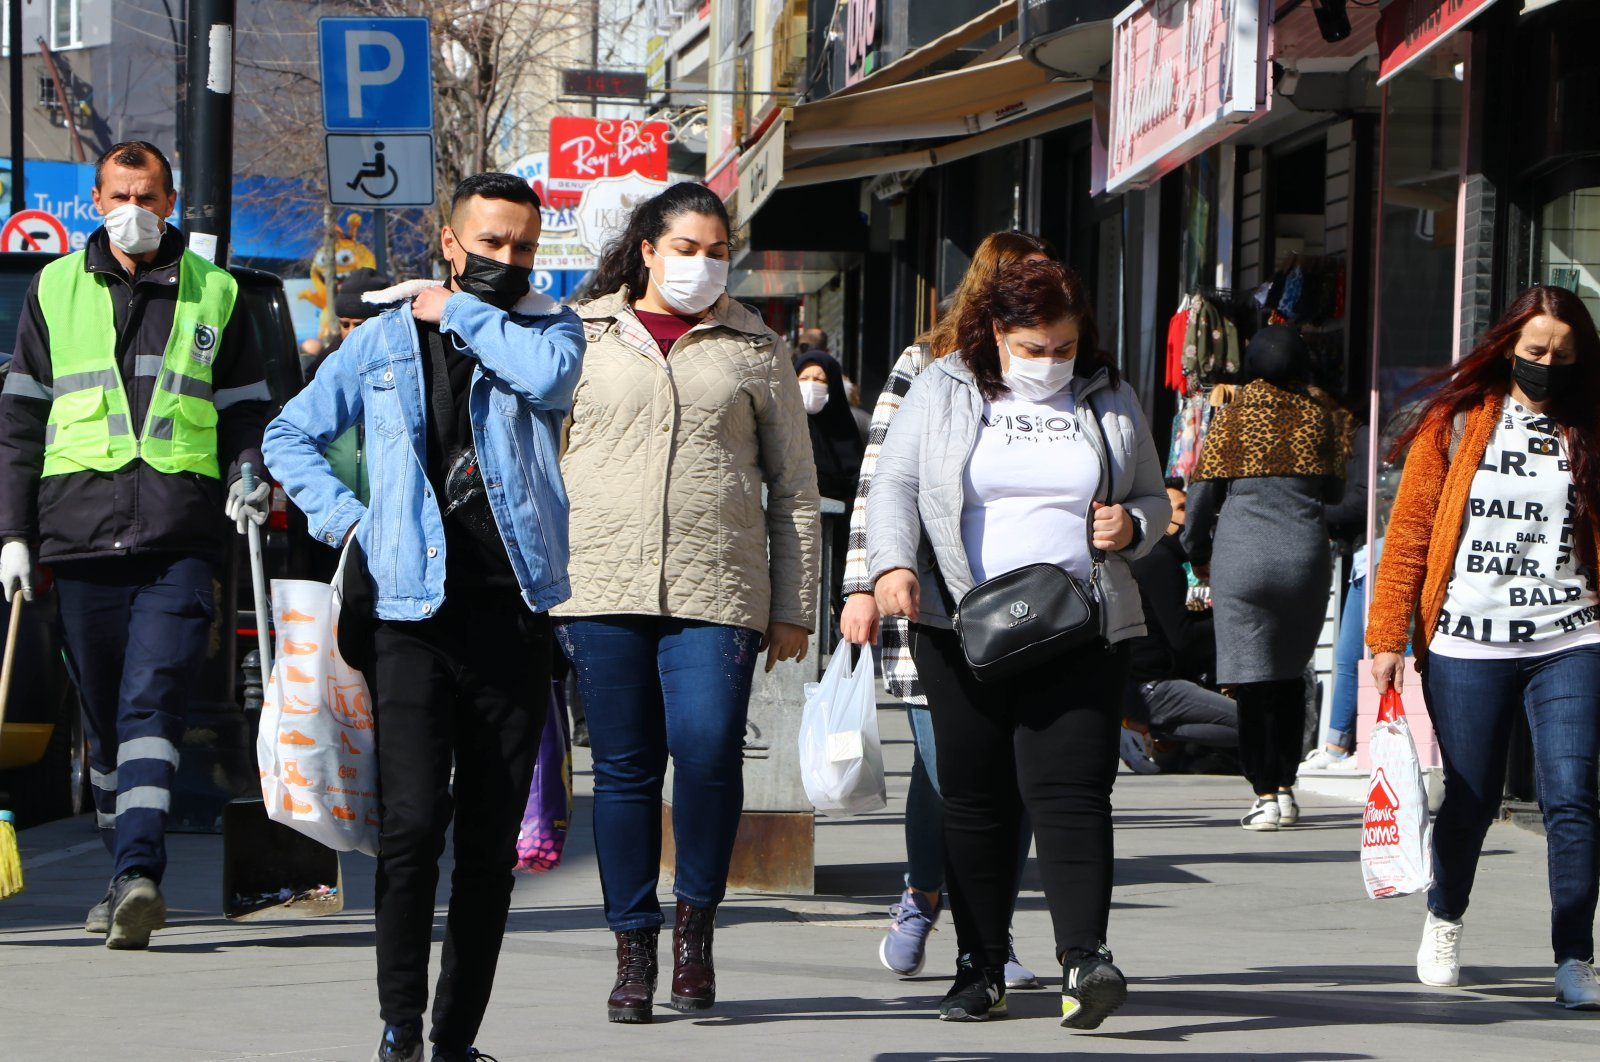 People wearing protective masks walk on a street in Tekirdağ, northwestern Turkey, March 1, 2021. (AA PHOTO)